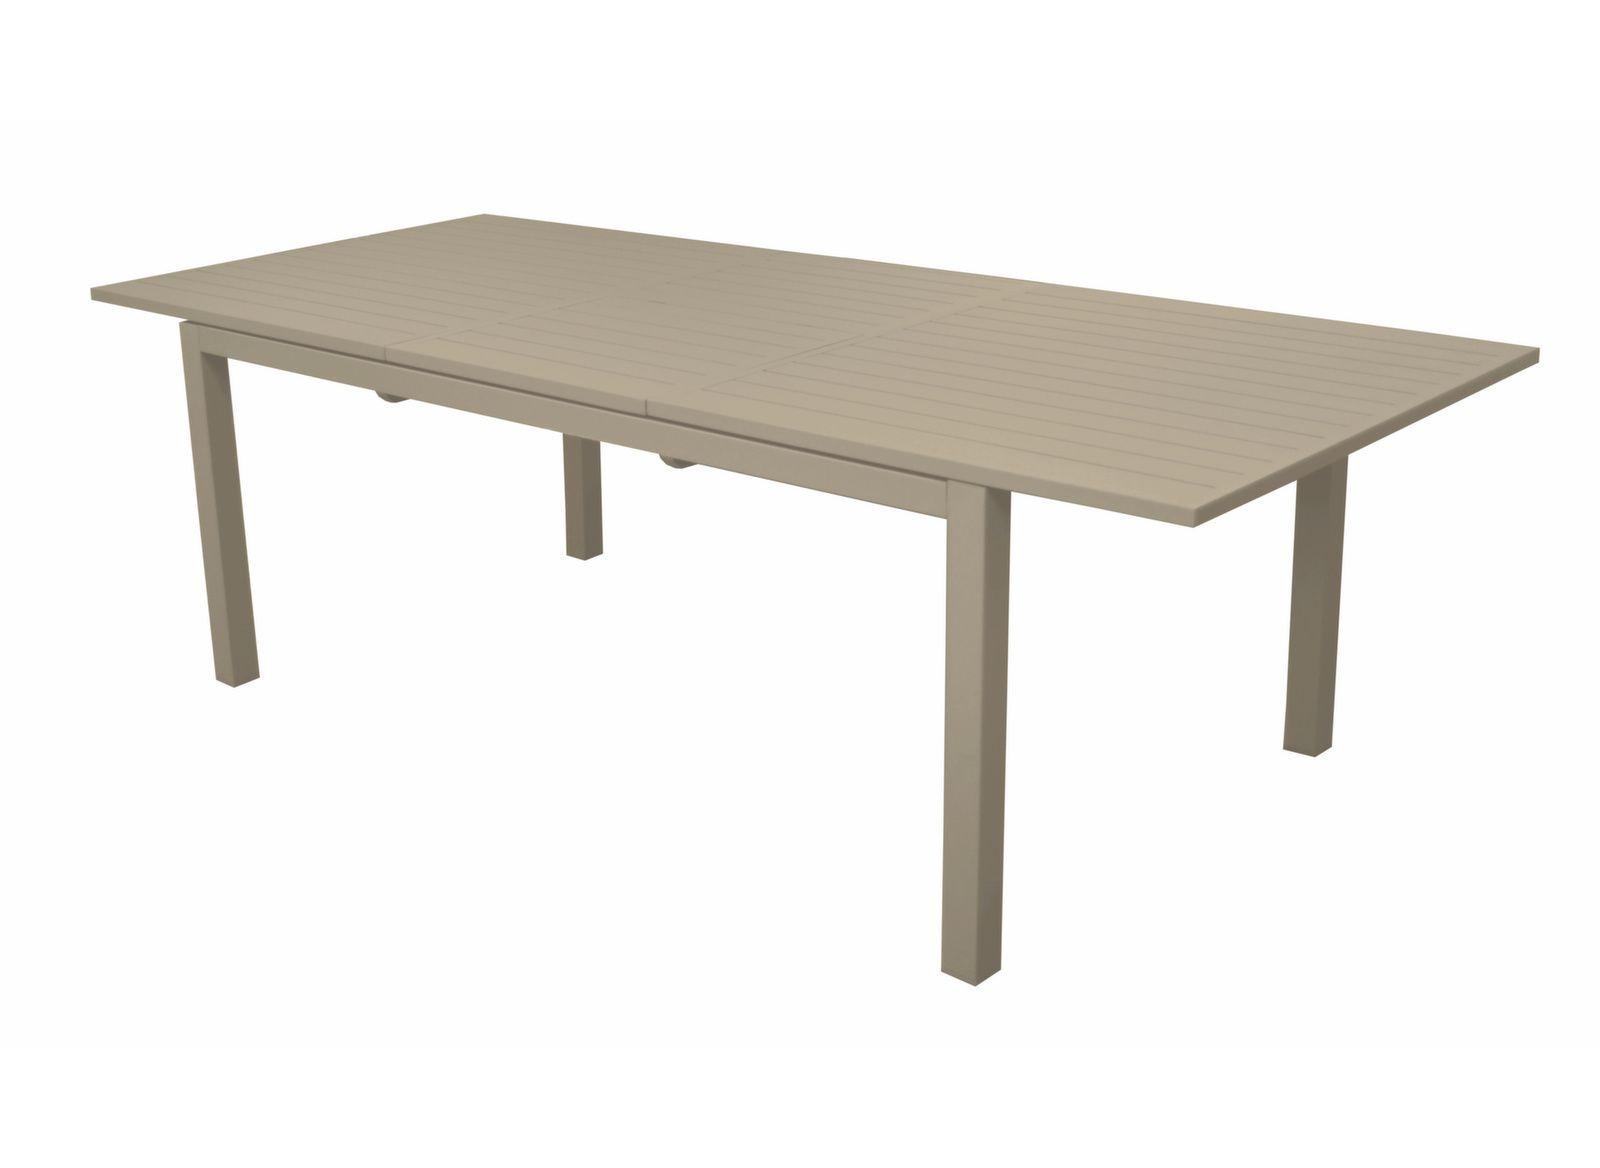 Table Trieste 160/240 cm